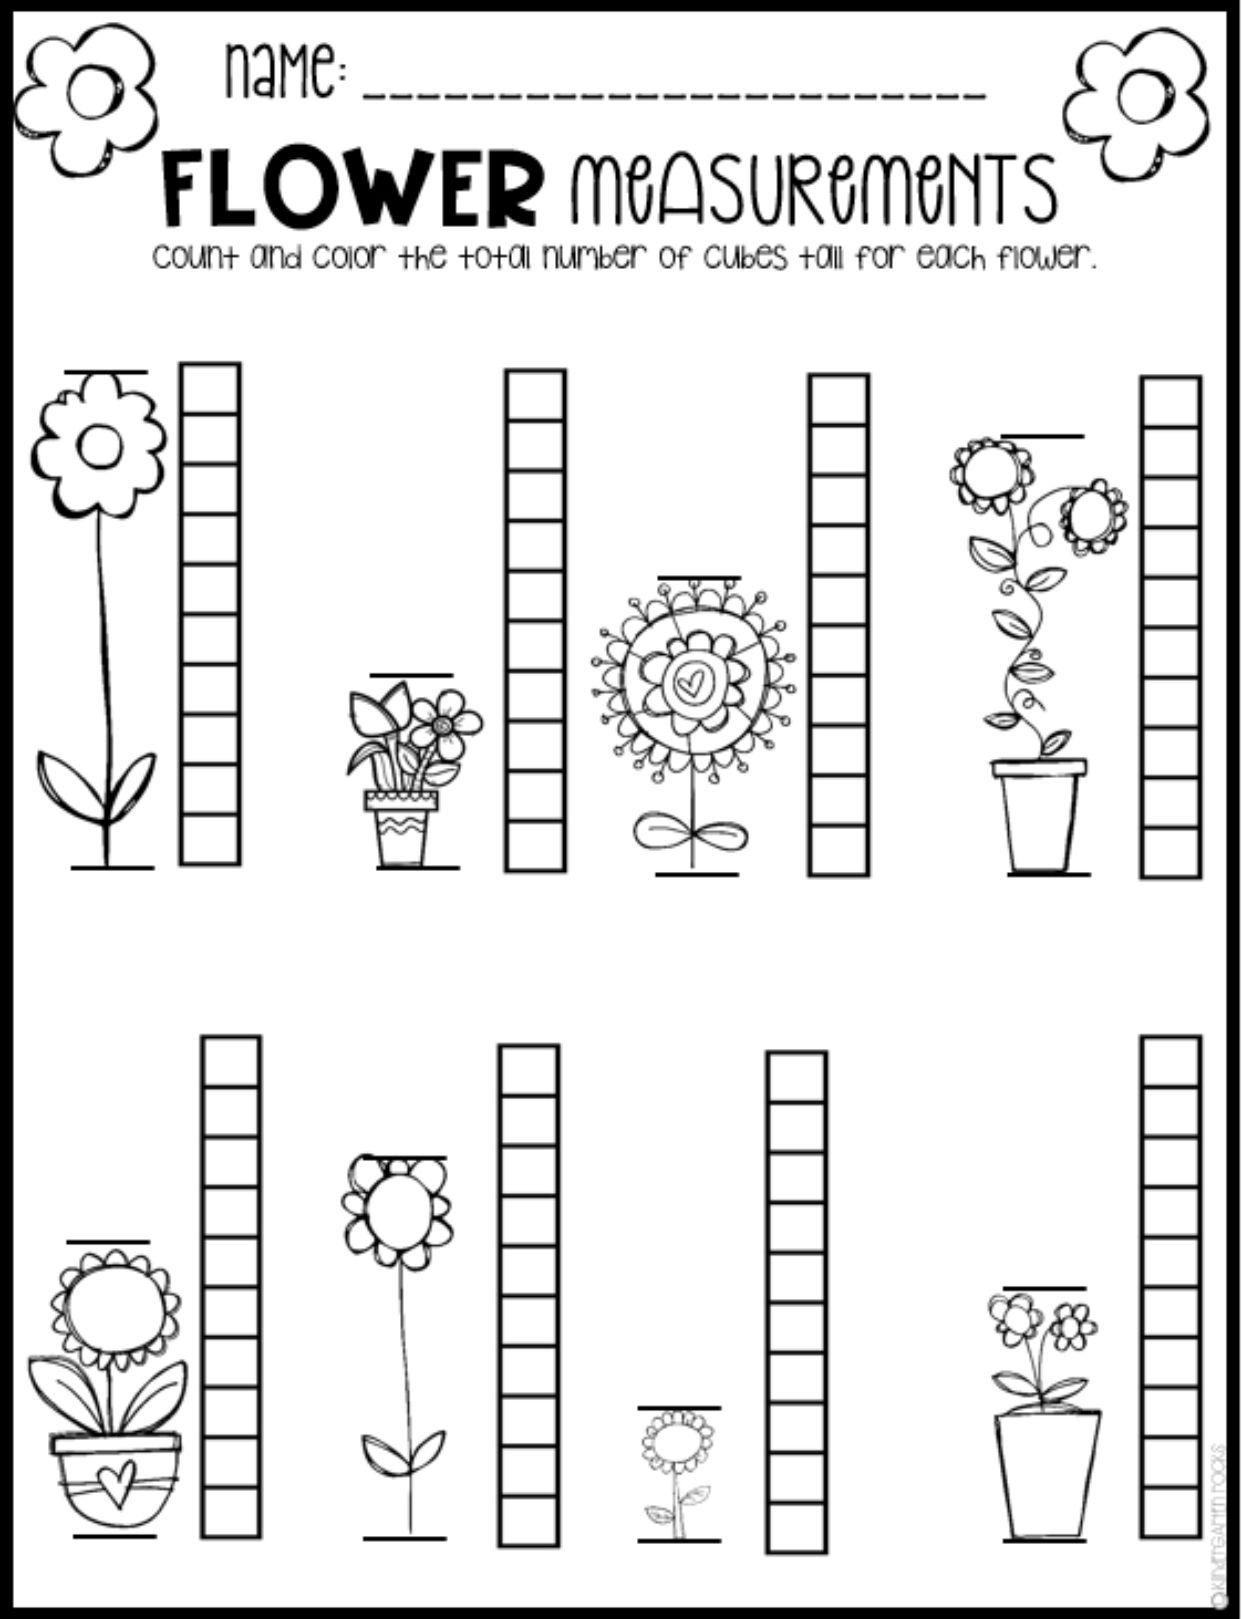 19 Best Preschool Worksheets Images On Best Worksheets